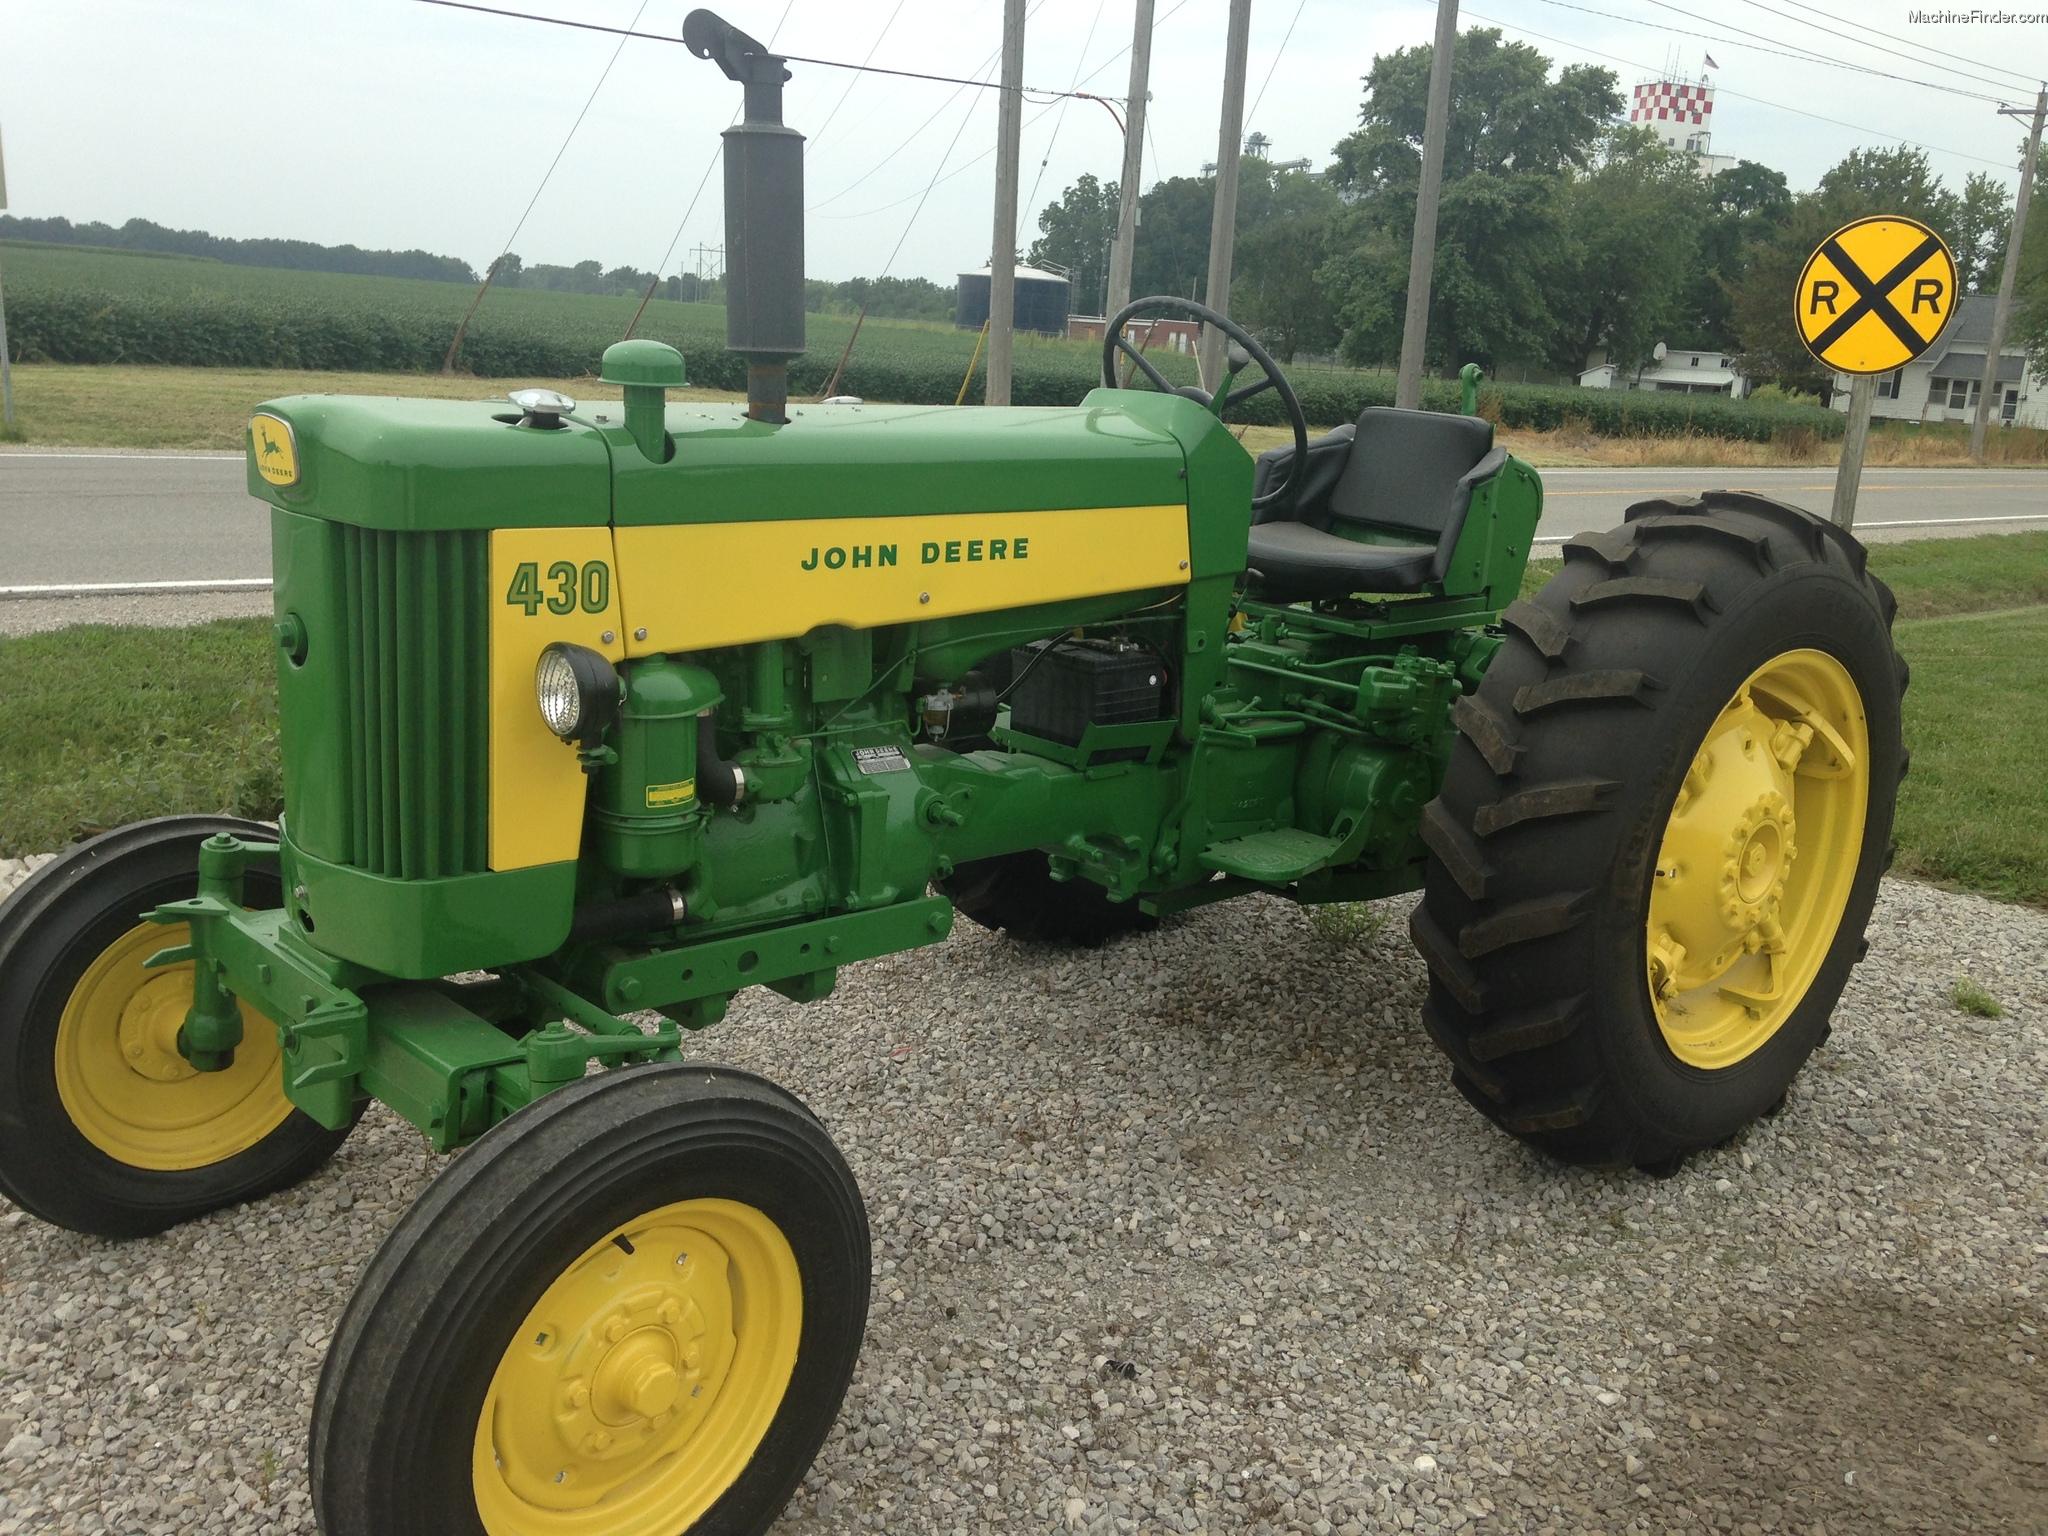 1959 John Deere 430 Tractors - Utility (40-100hp) - John ...